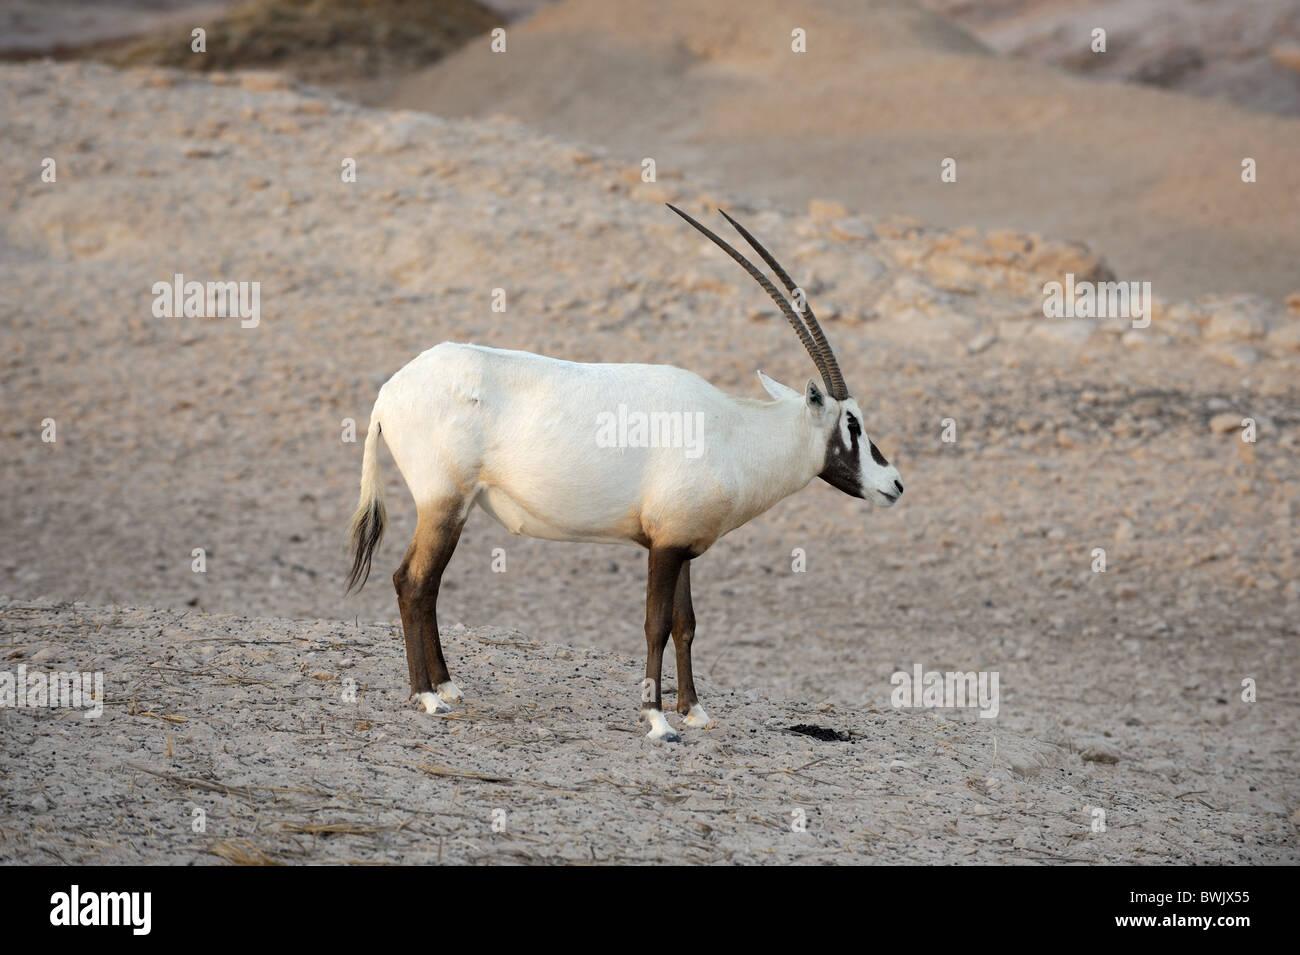 Arabian oryx (Oryx leucoryx) on Sir Bani Yas Island Wildlife Reserve, Abu Dhabi - Stock Image